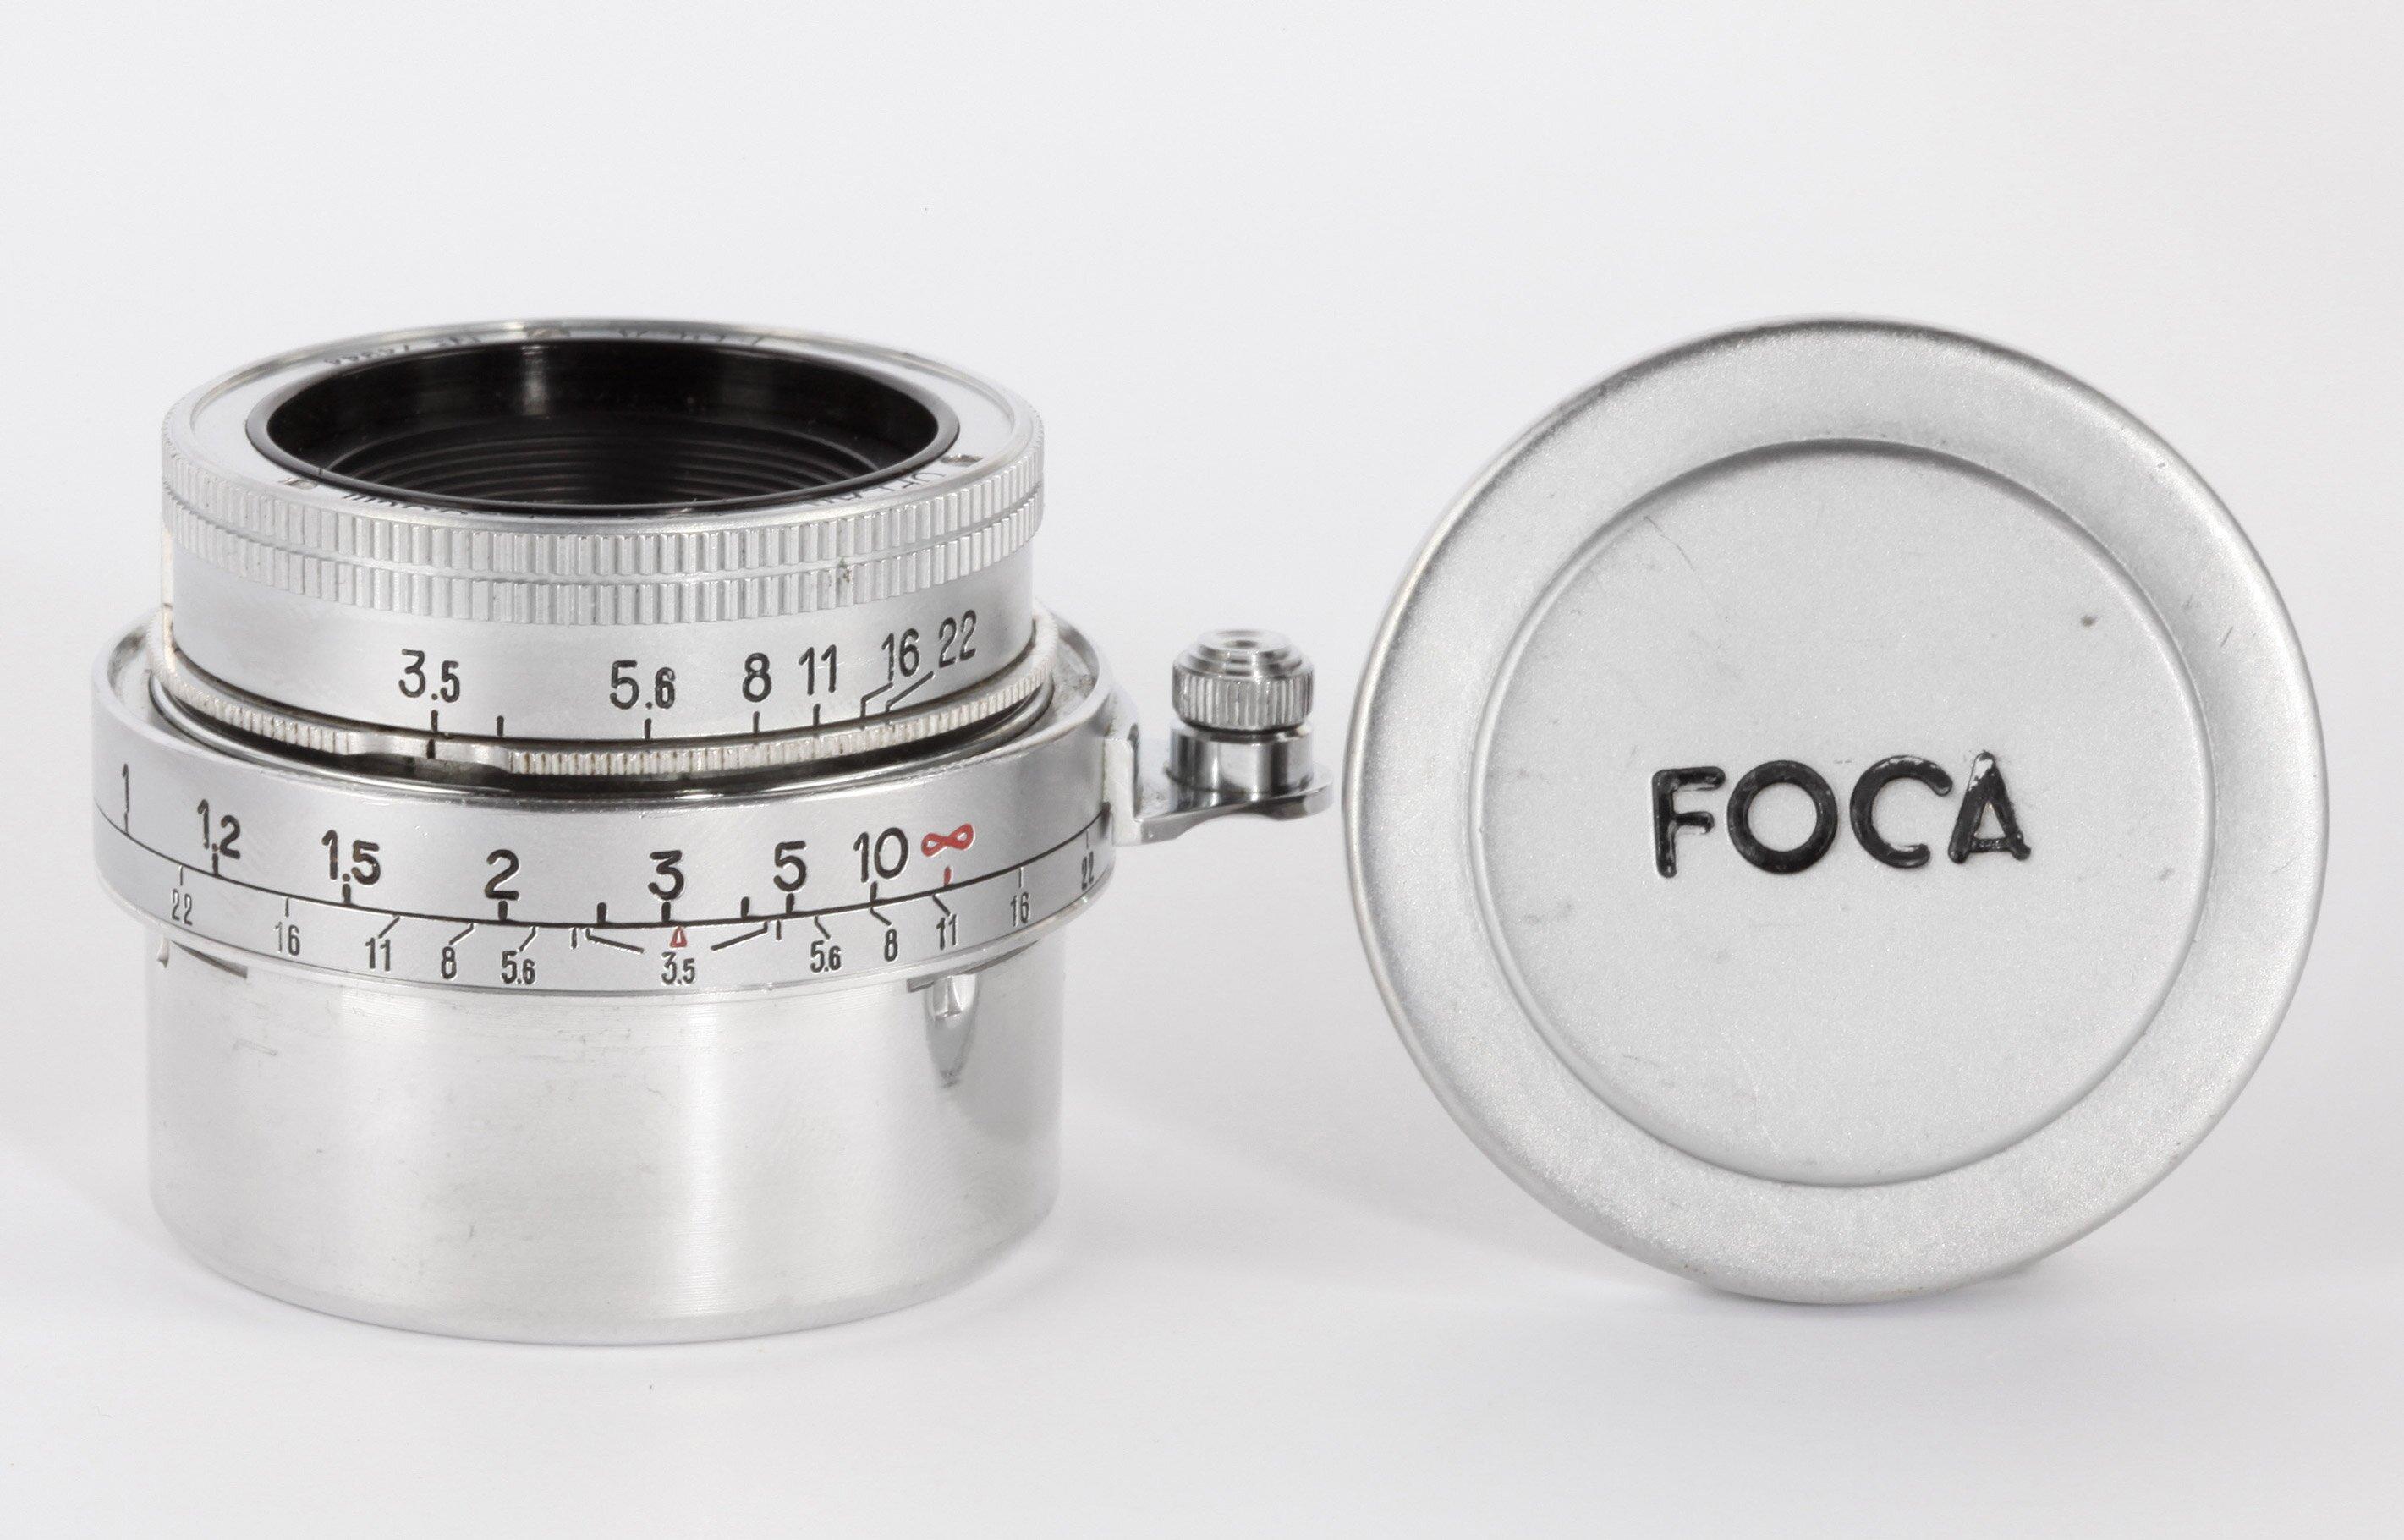 Foca Oplar 3,5/3,5cm f.Contax Messsucherkamera